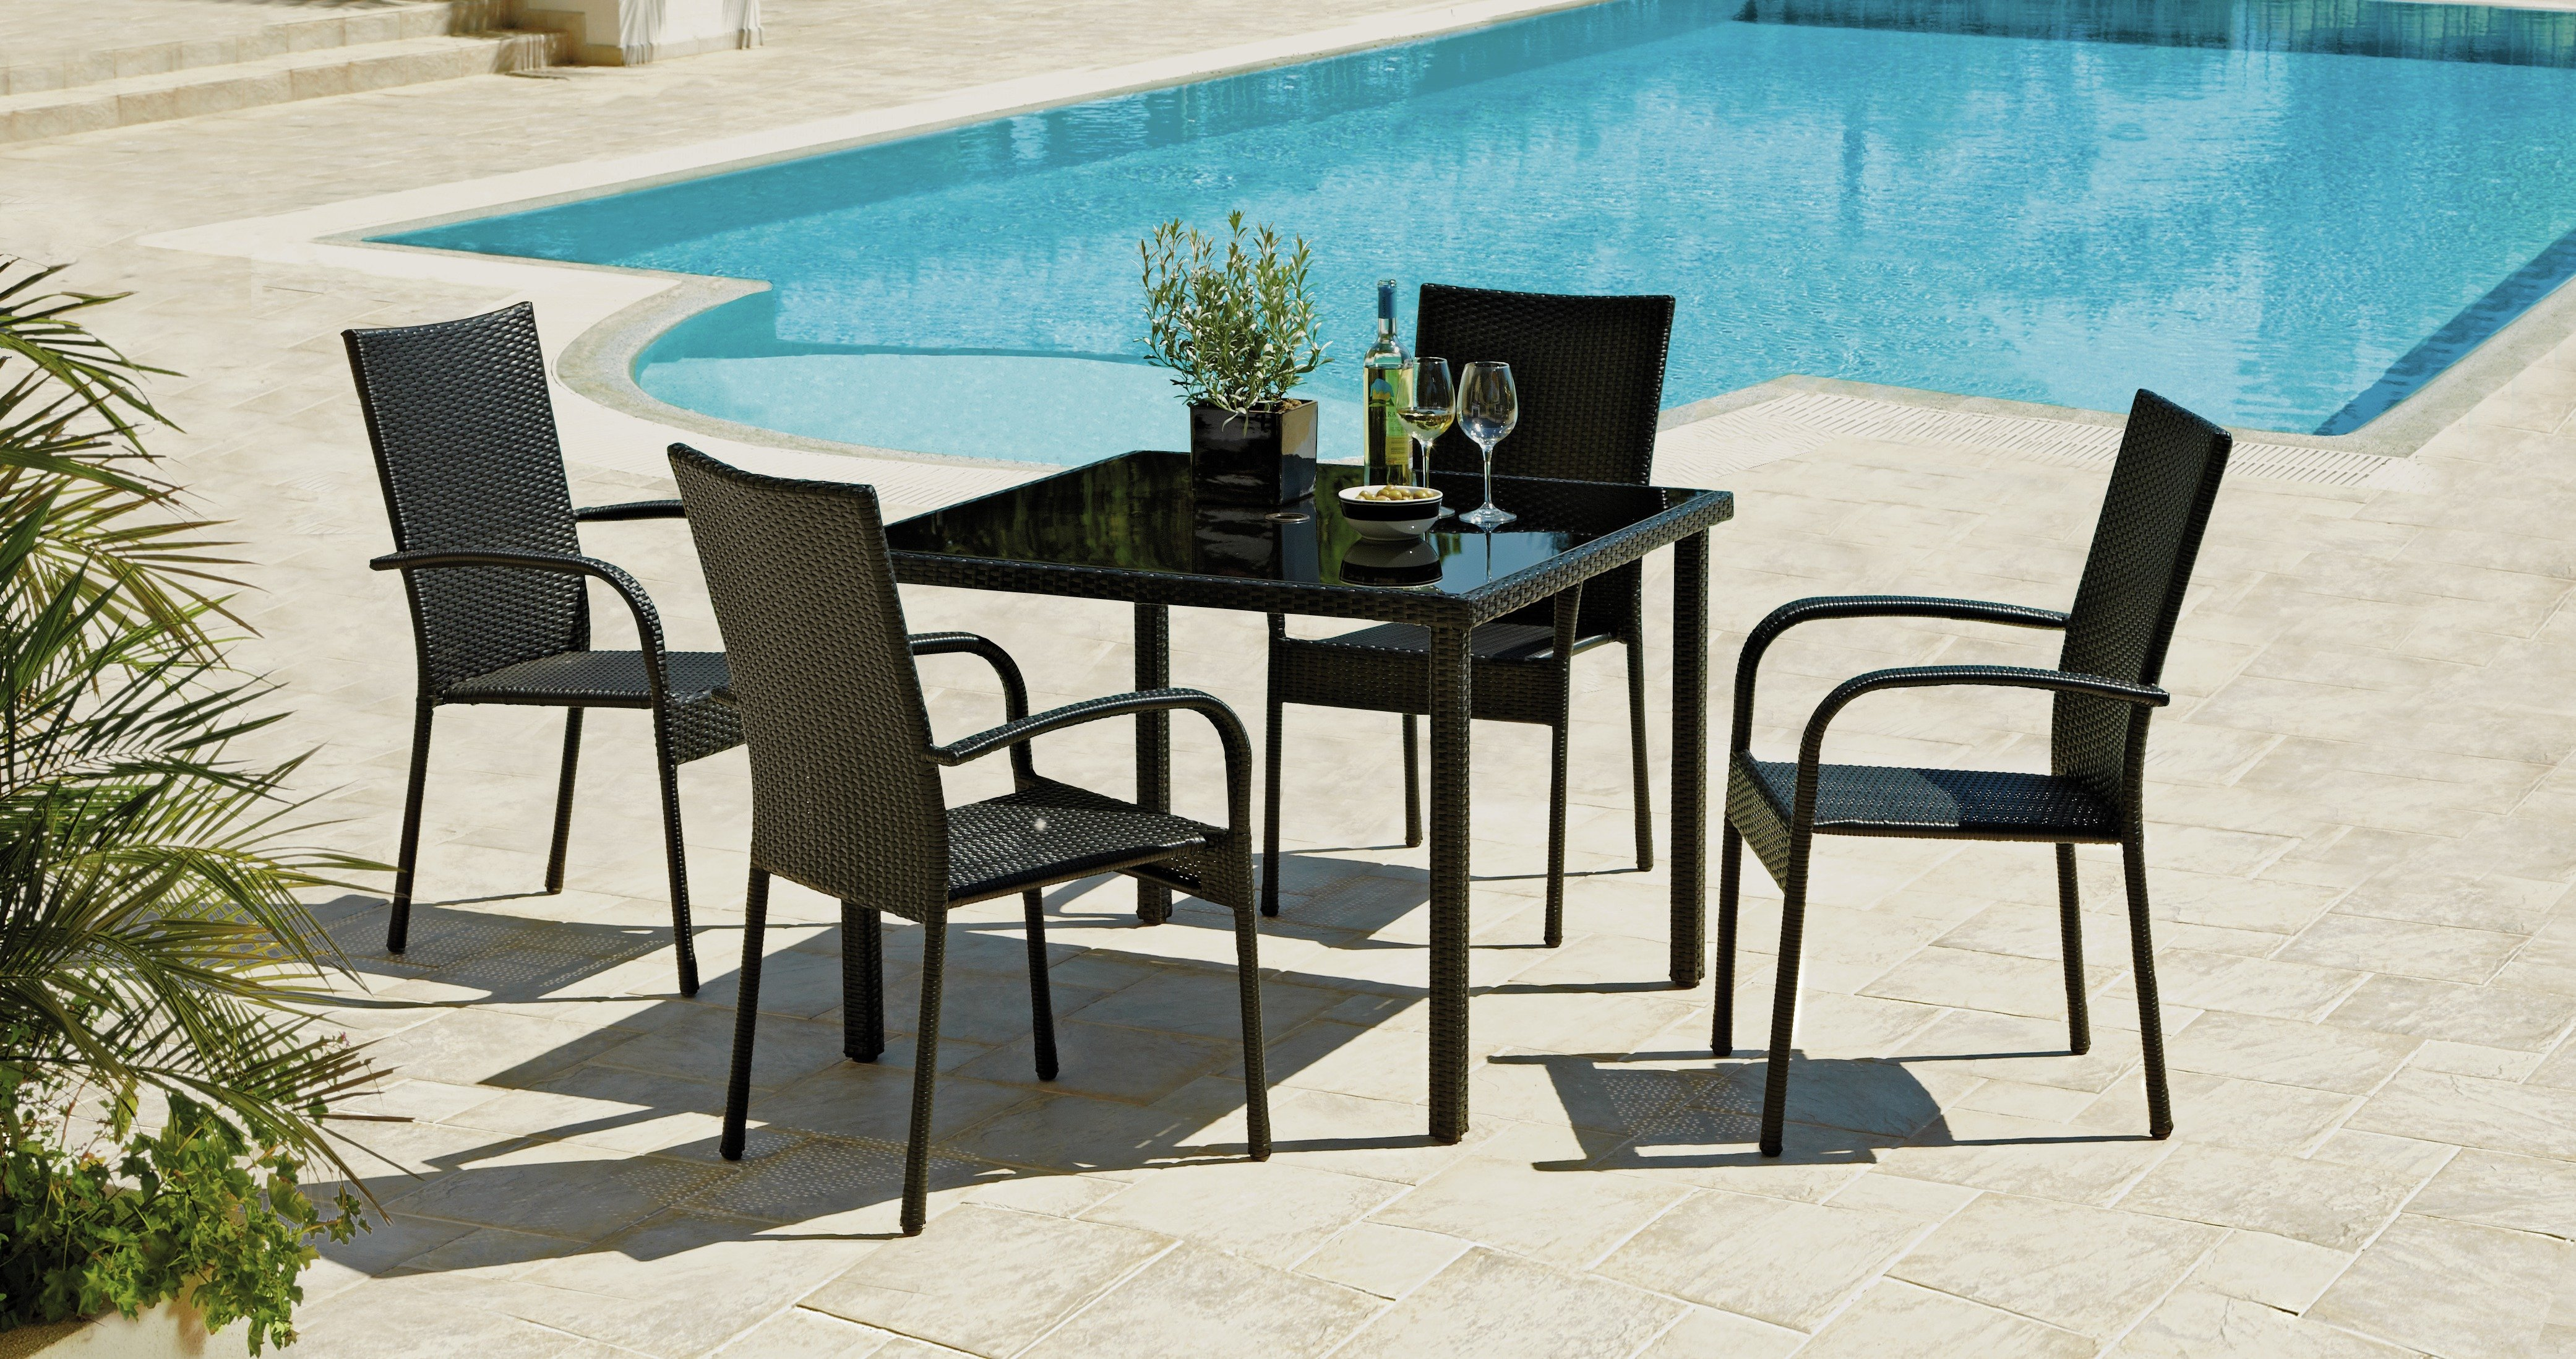 sale on lima rattan effect 4 seater patio furniture. Black Bedroom Furniture Sets. Home Design Ideas